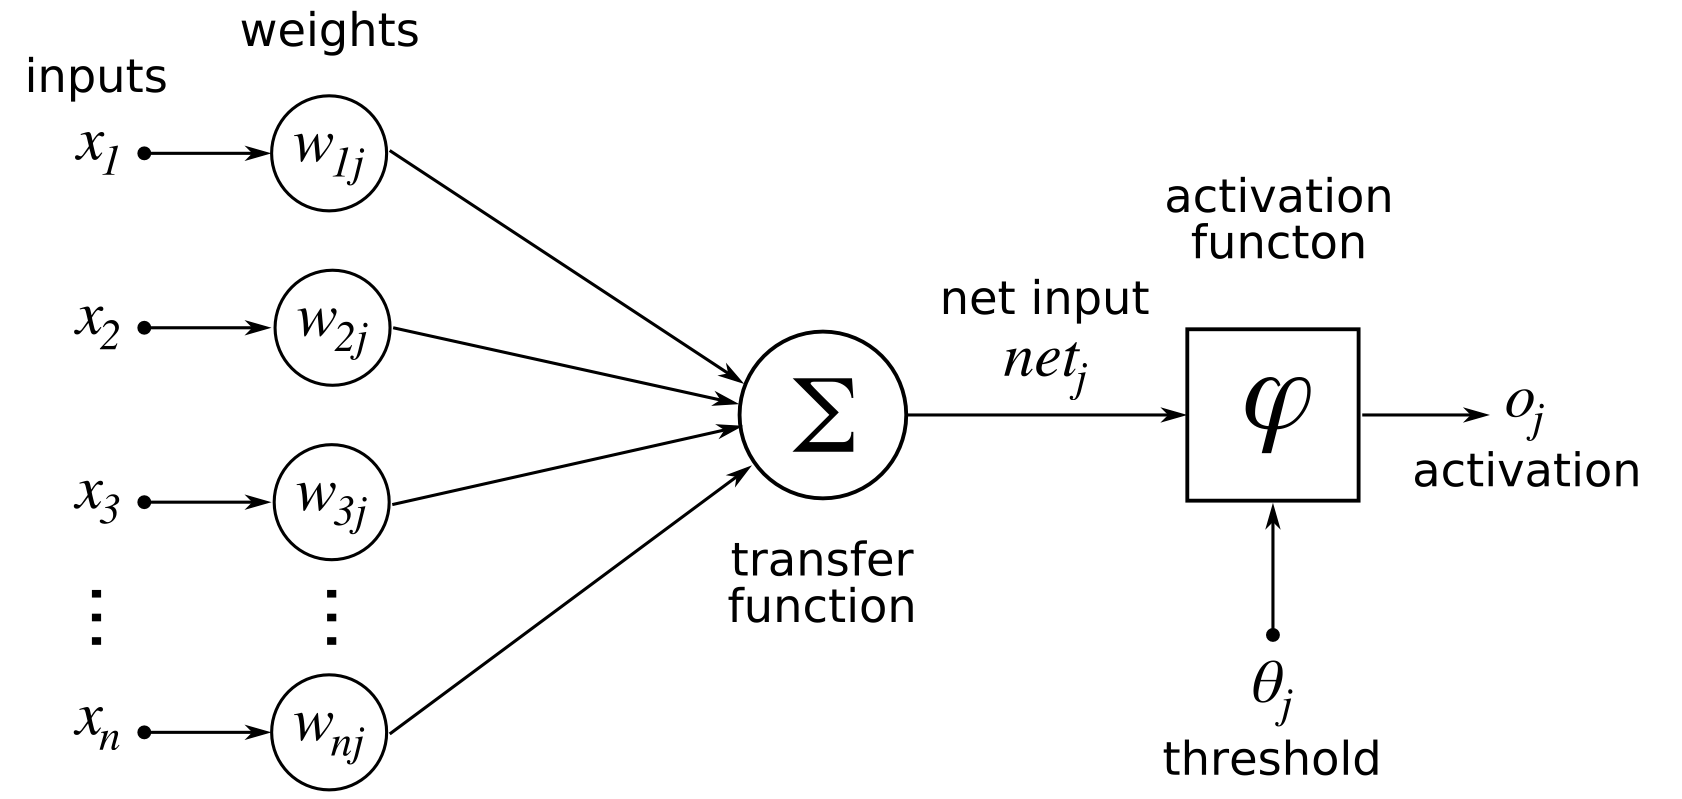 basic neuron diagram fujitsu ten wiring isuzu artificial neural networks